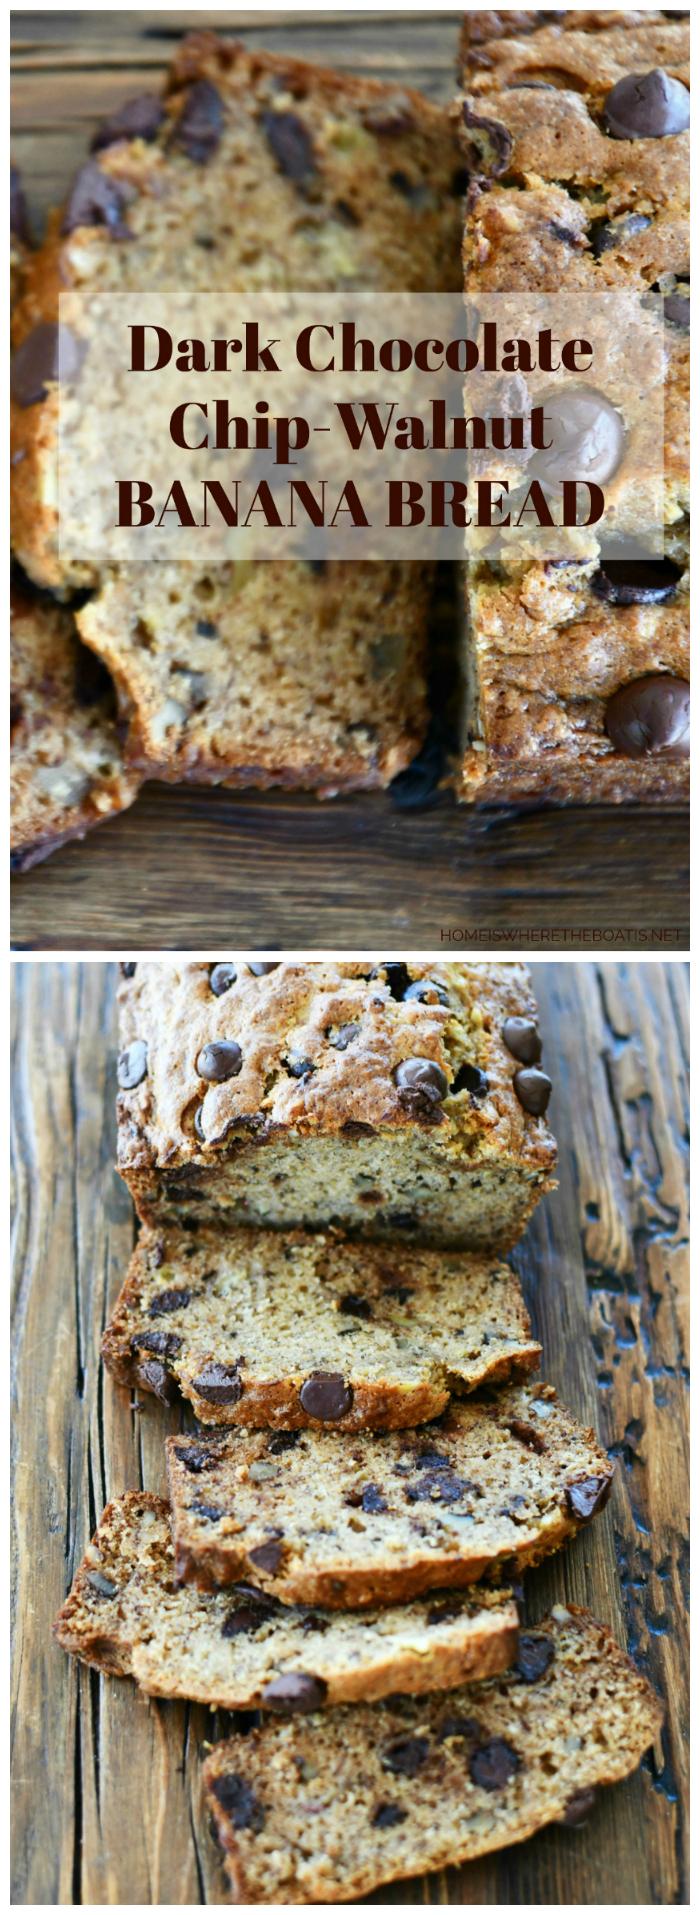 Dark Chocolate Chip-Walnut Banana Bread   ©homeiswheretheboatis.net #quickbread #recipes #banana #chocolate